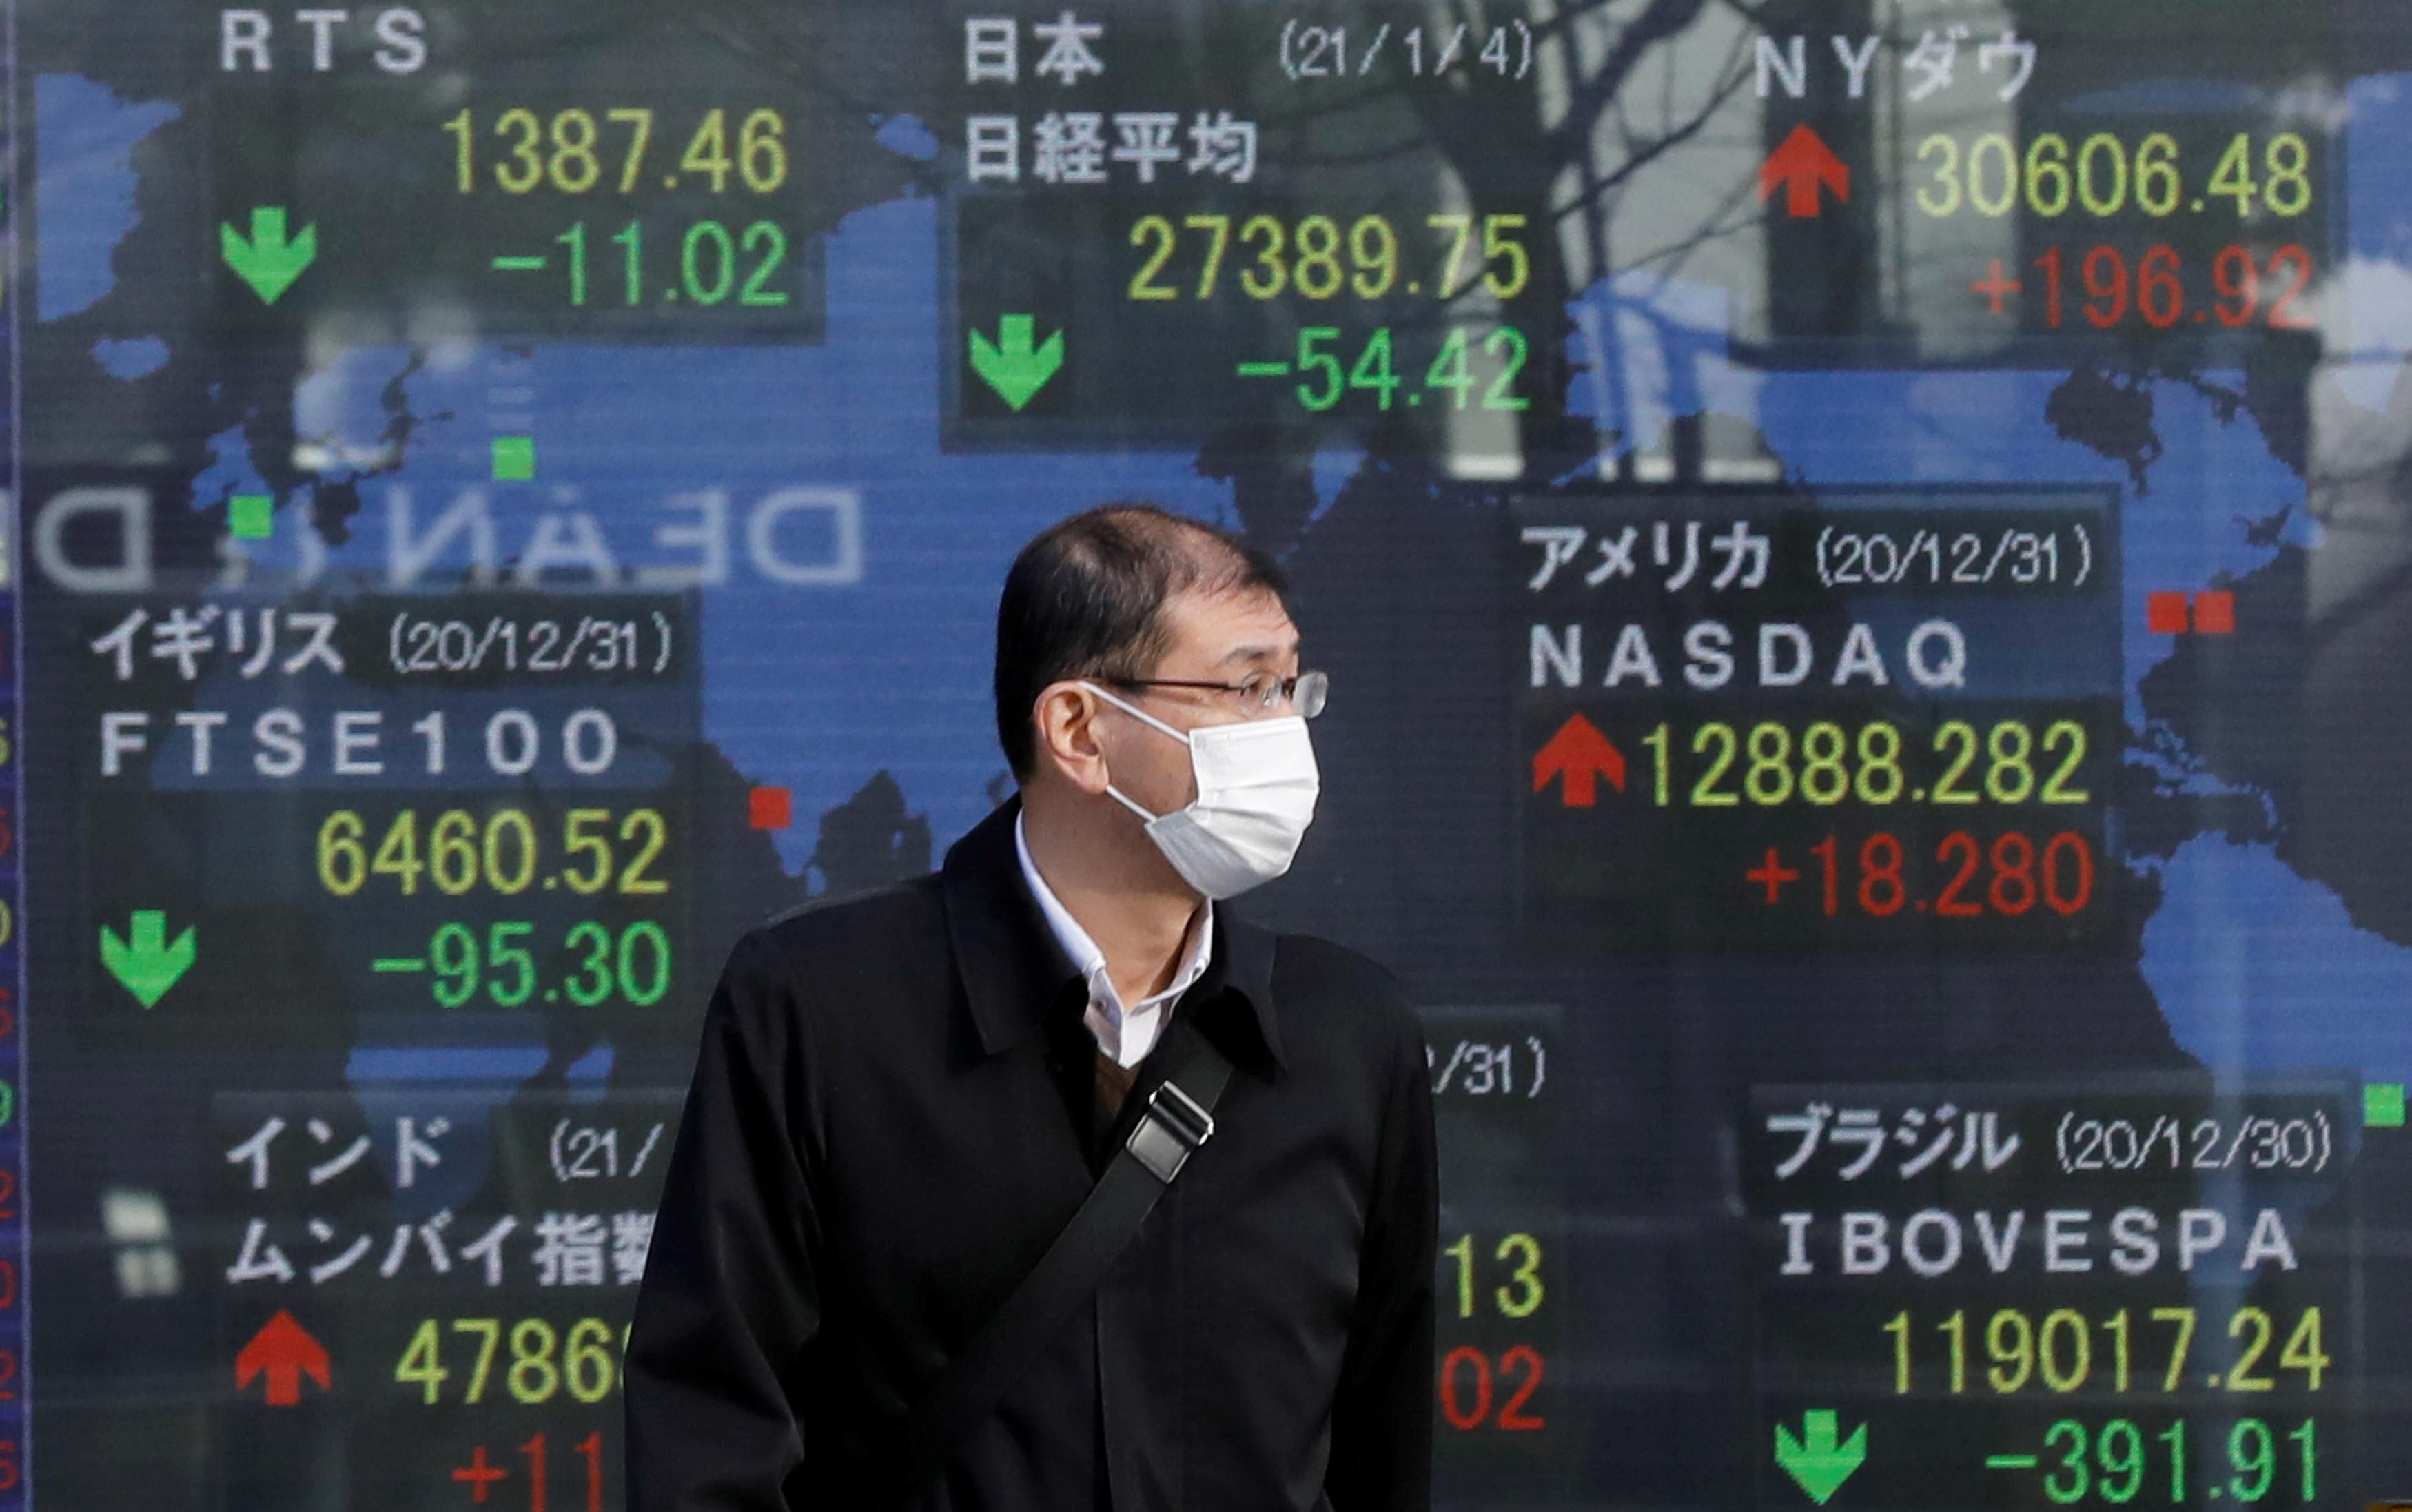 A man wearing a facial mask in Tokyo, Japan, January 4, 2021. REUTERS/Kim Kyung-Hoon